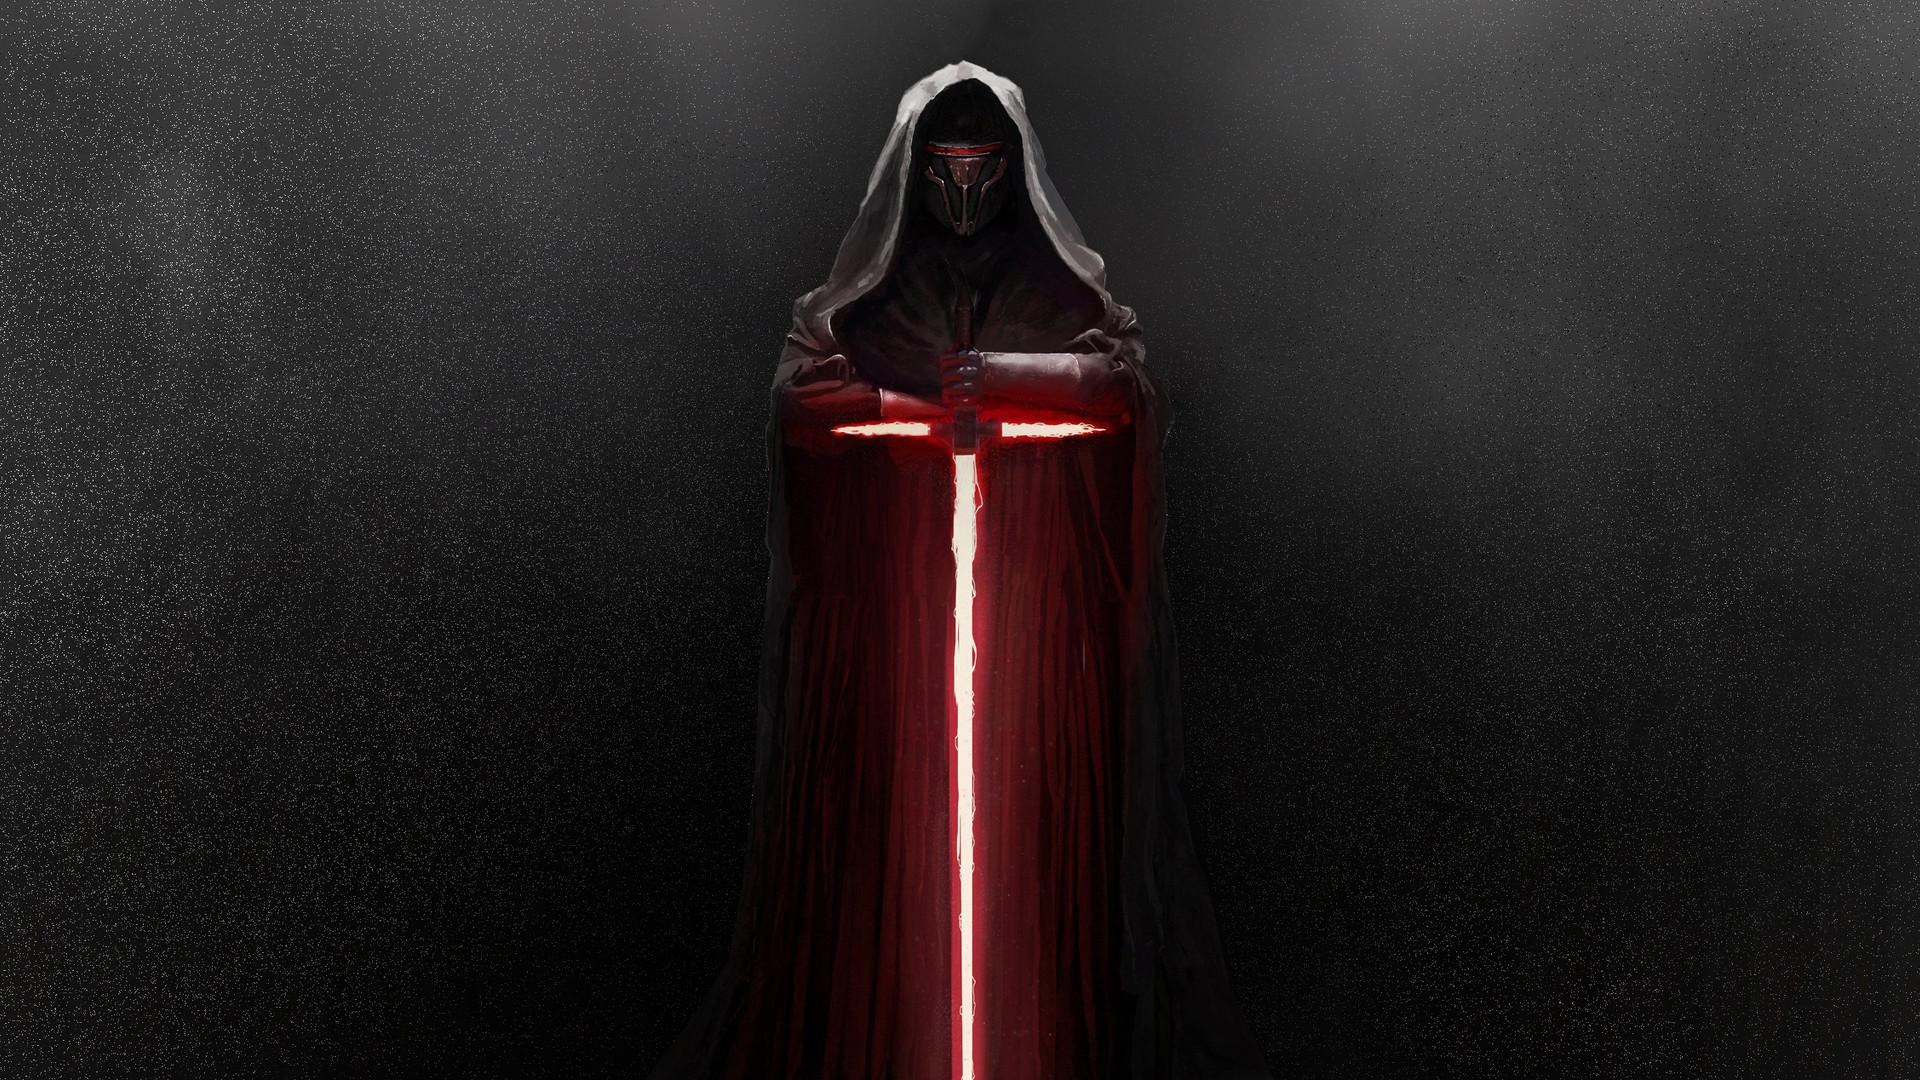 kylo-ren-lightsaber-star-wars-new.jpg